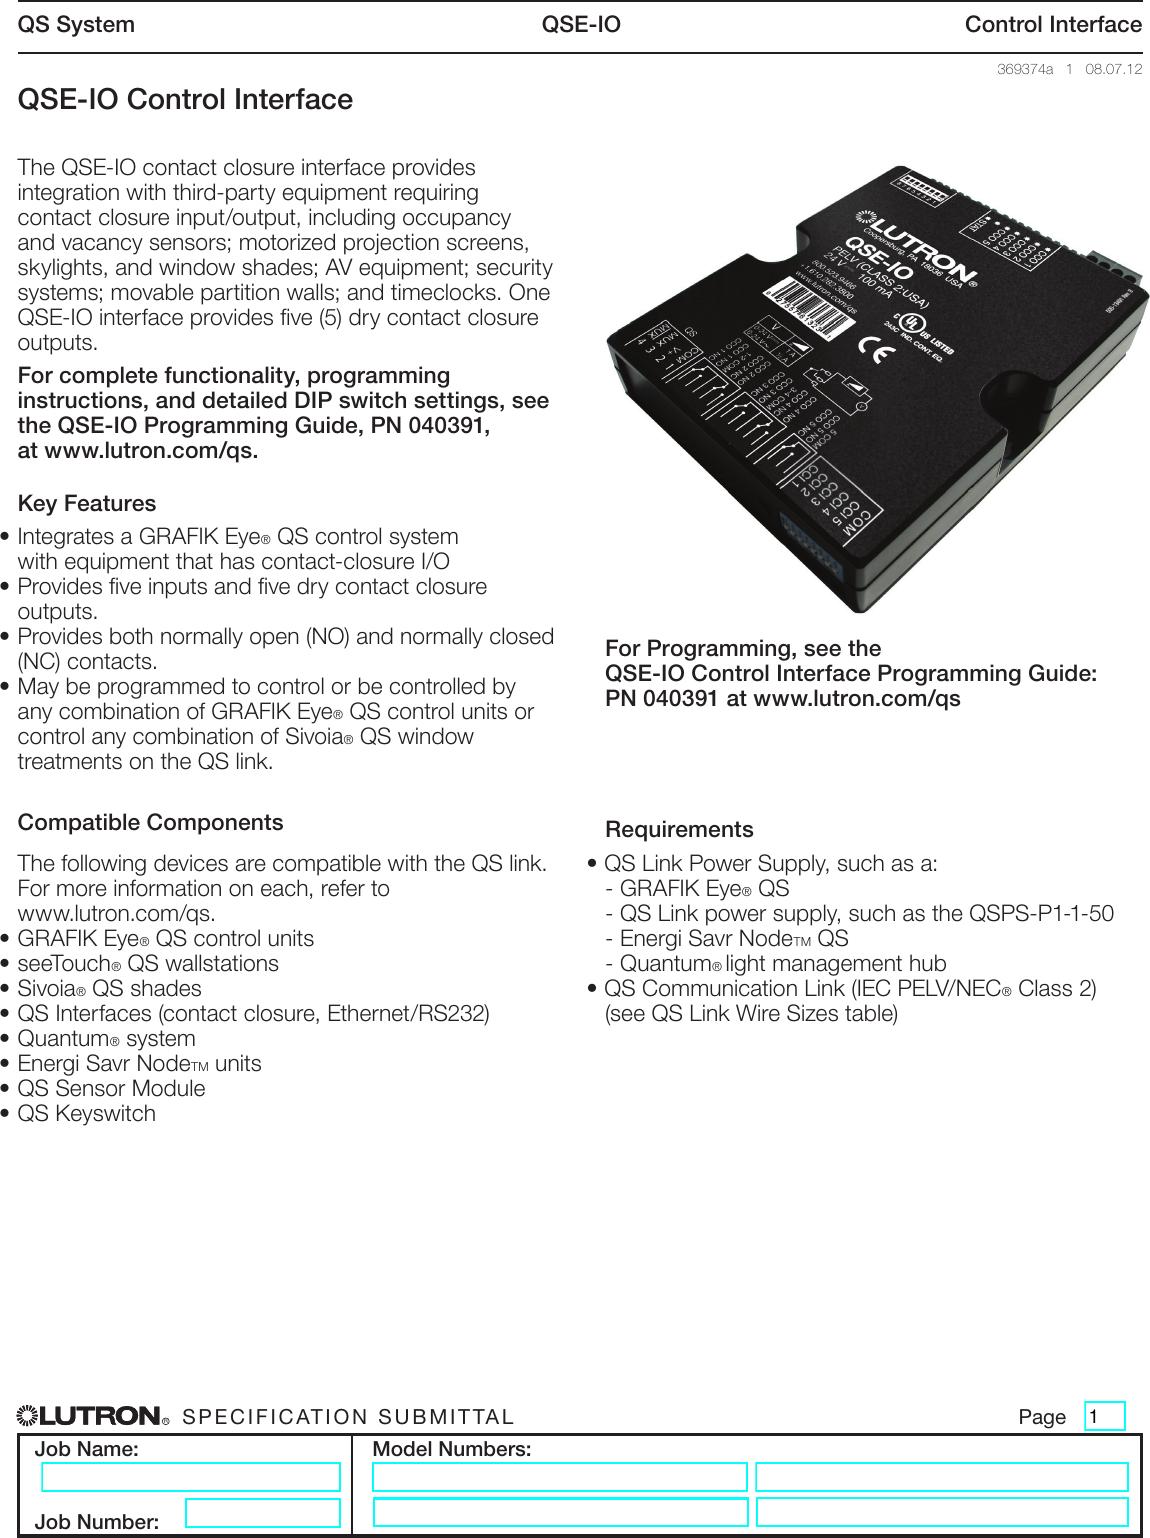 Qse Io Control Interface Brochure Pnp 24v Wiring Diagrams For Eyes Photo